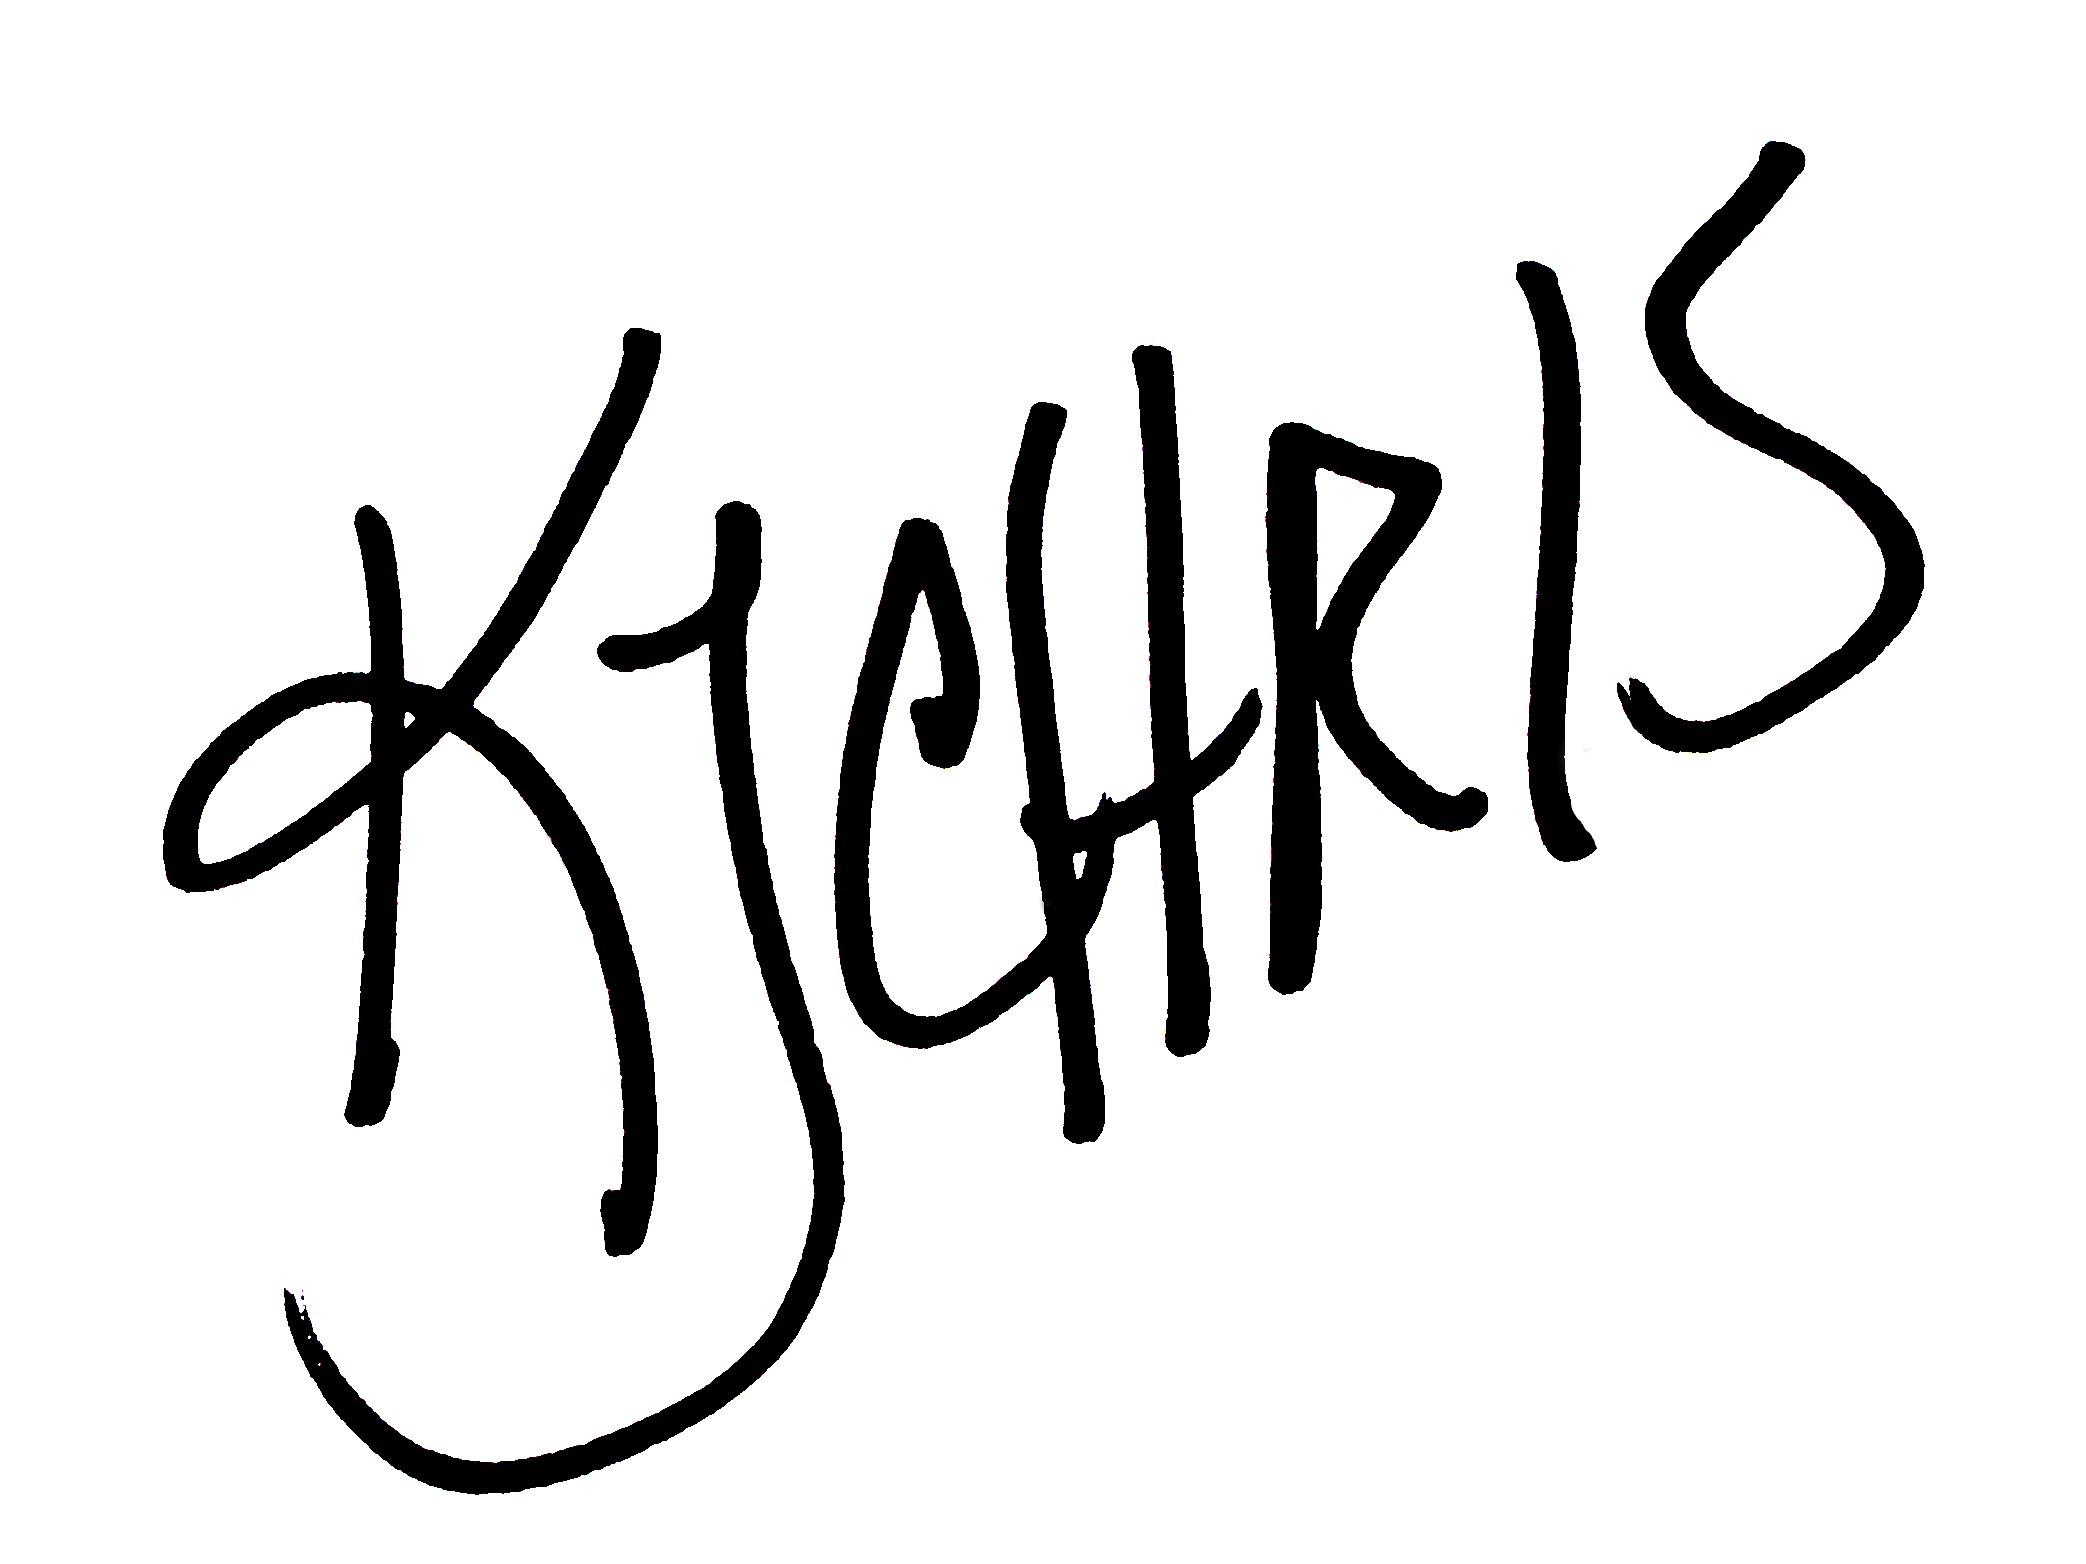 K.J.Chris's Signature